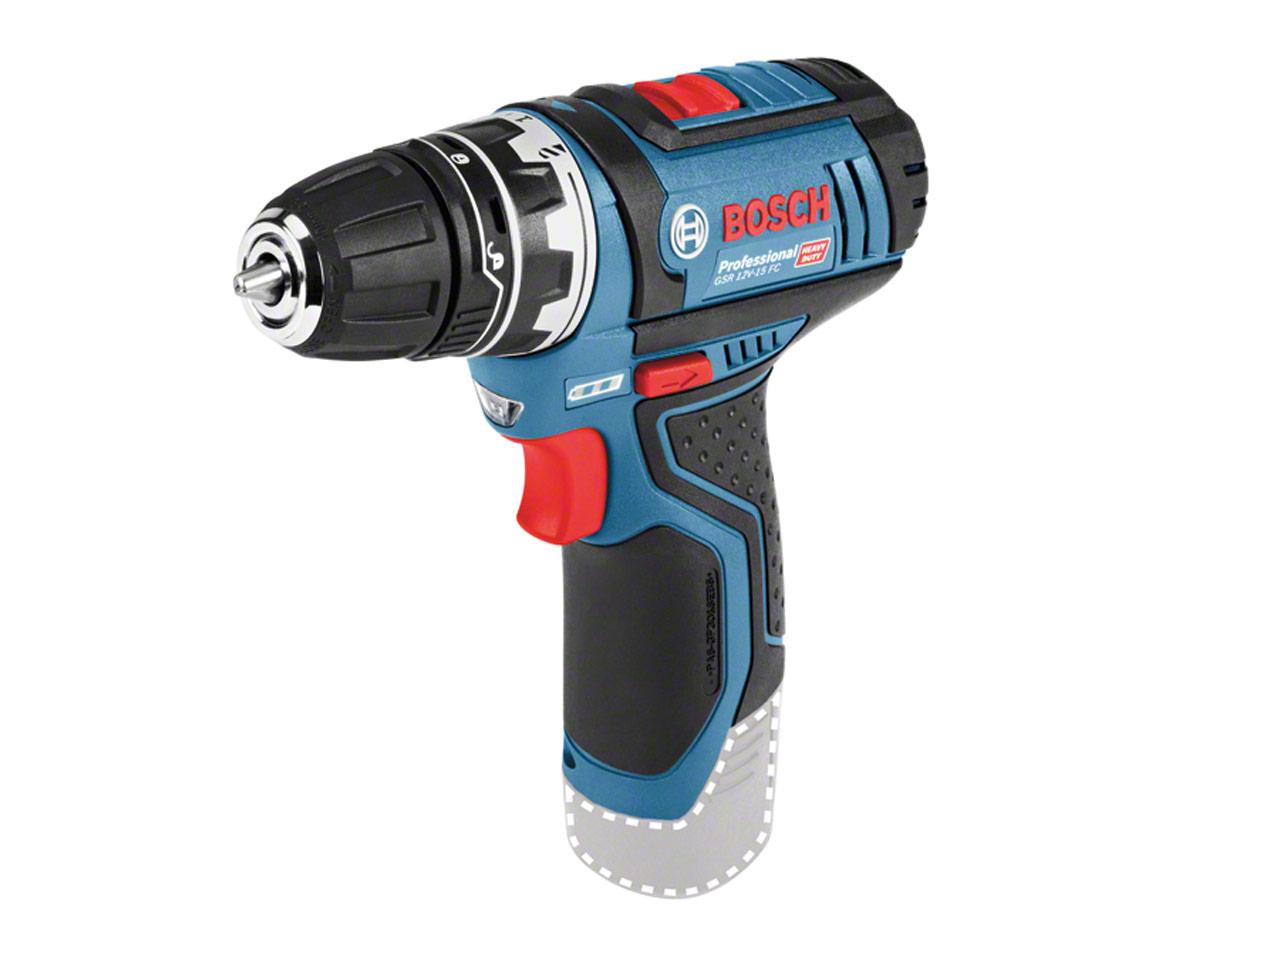 Bit holder for BOSCH cordless drill